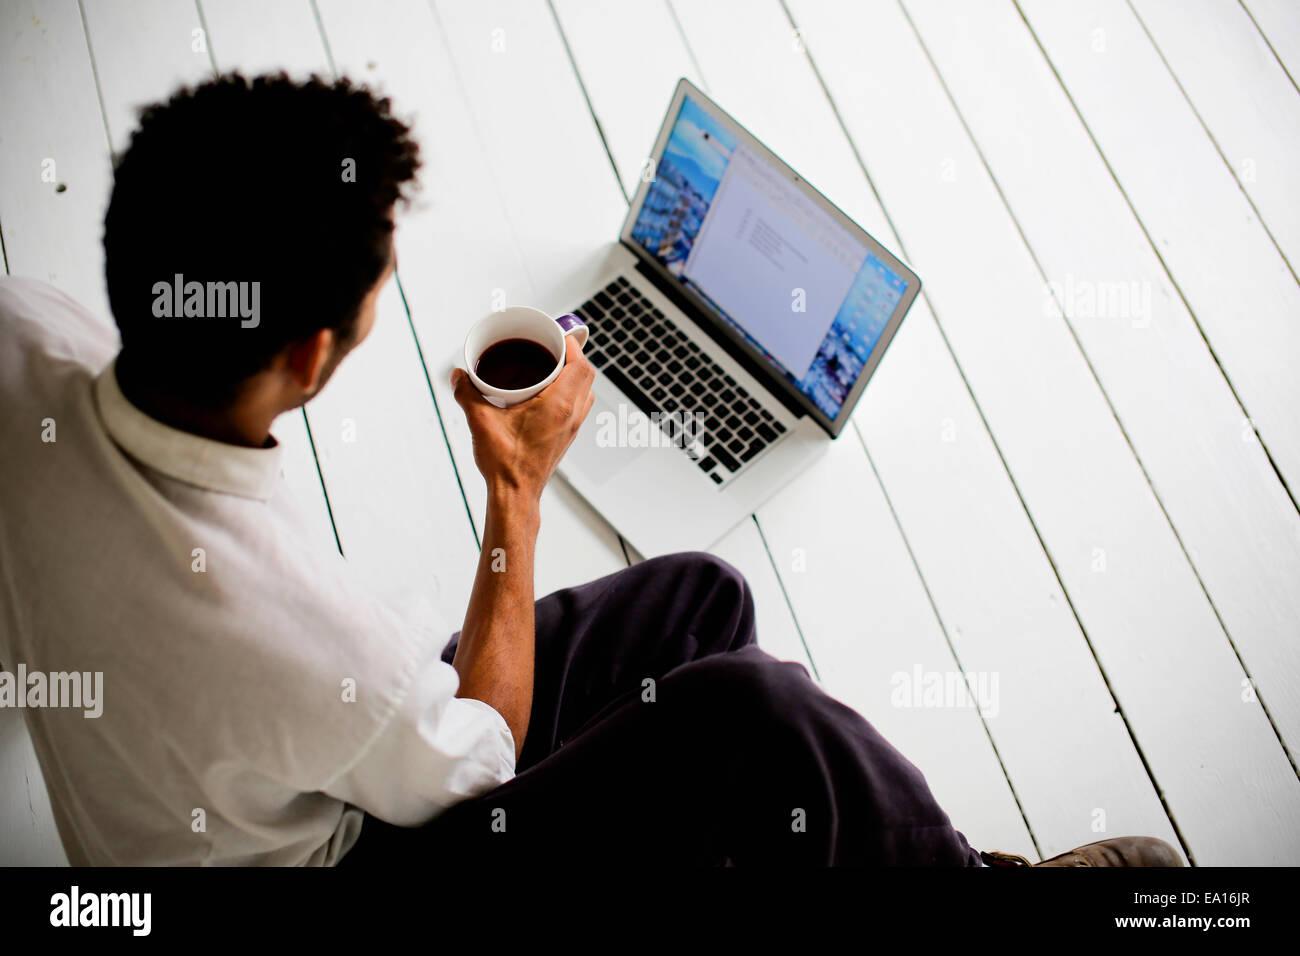 Graphic designer using laptop on floor - Stock Image